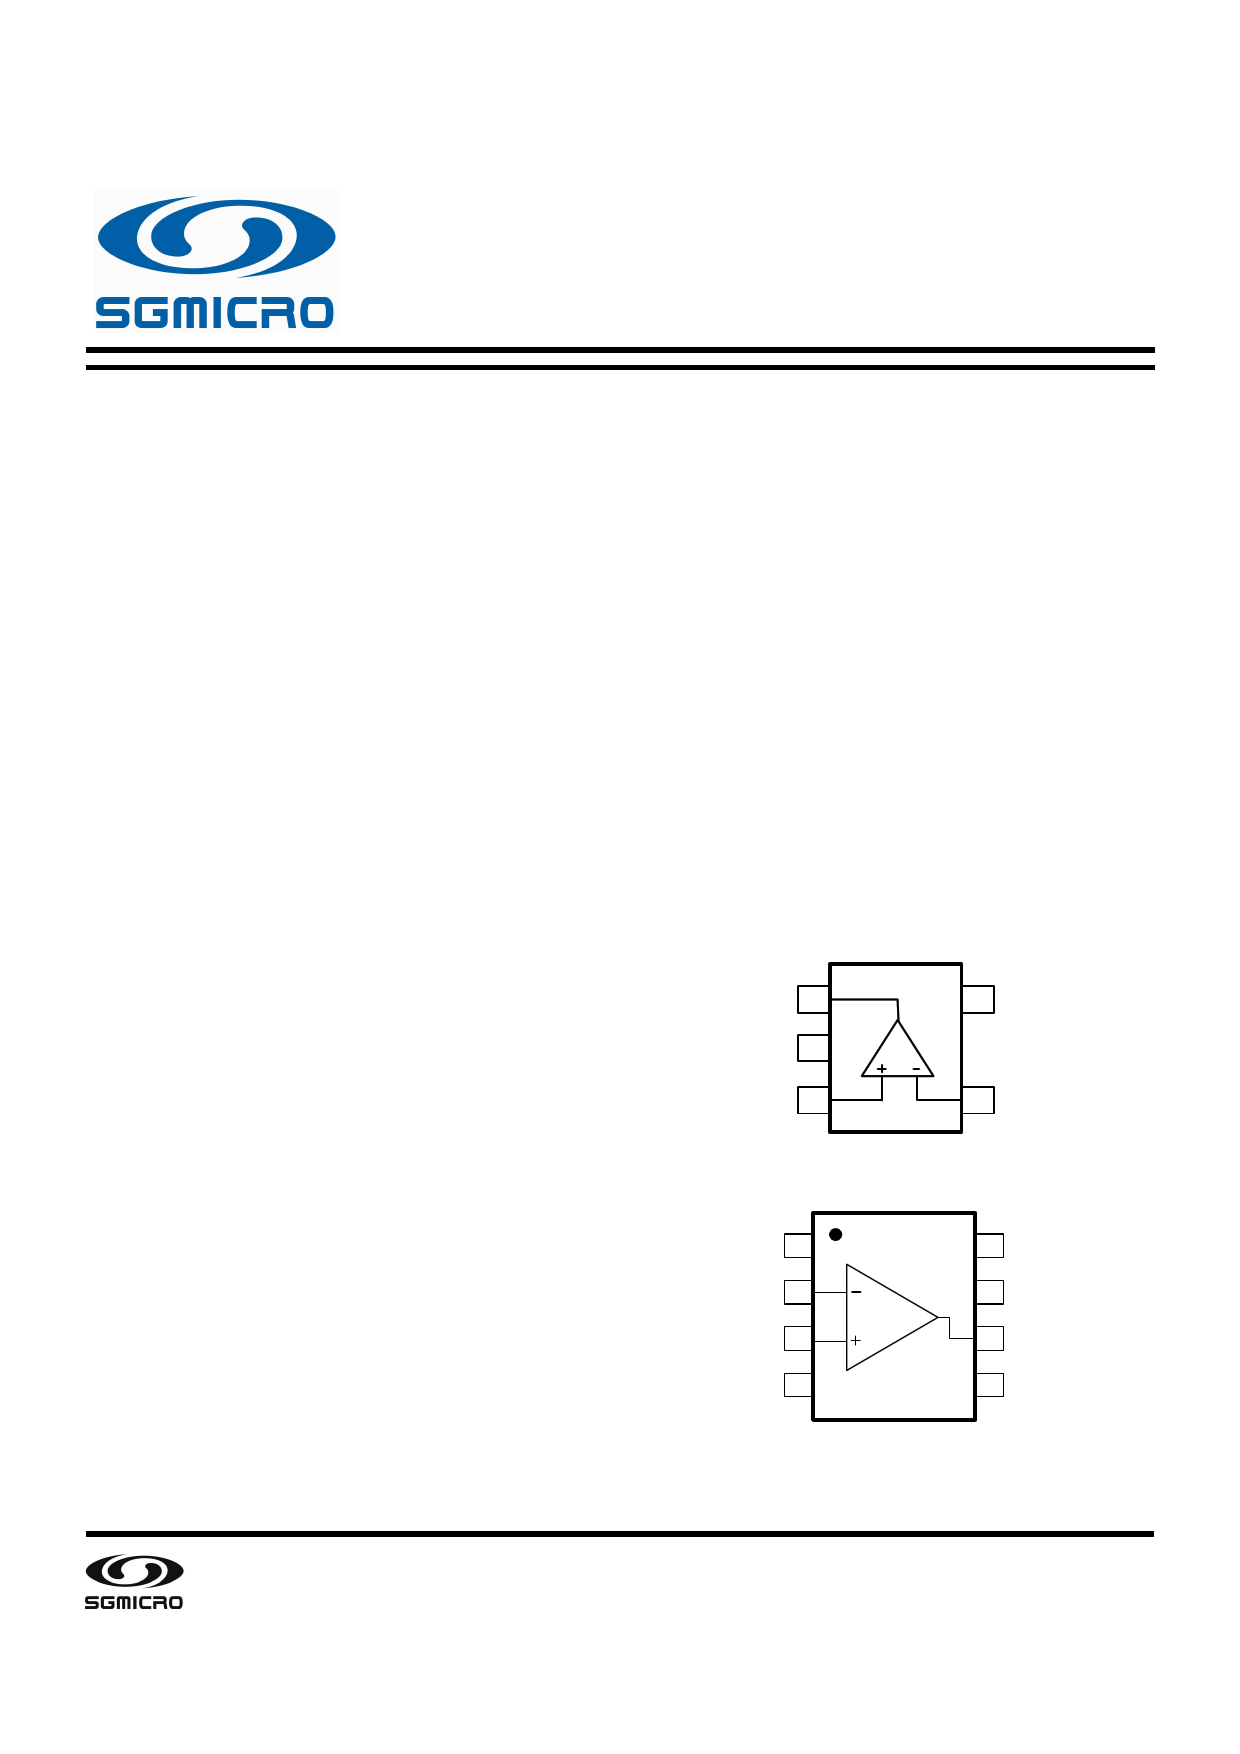 SGM8581 datasheet, circuit